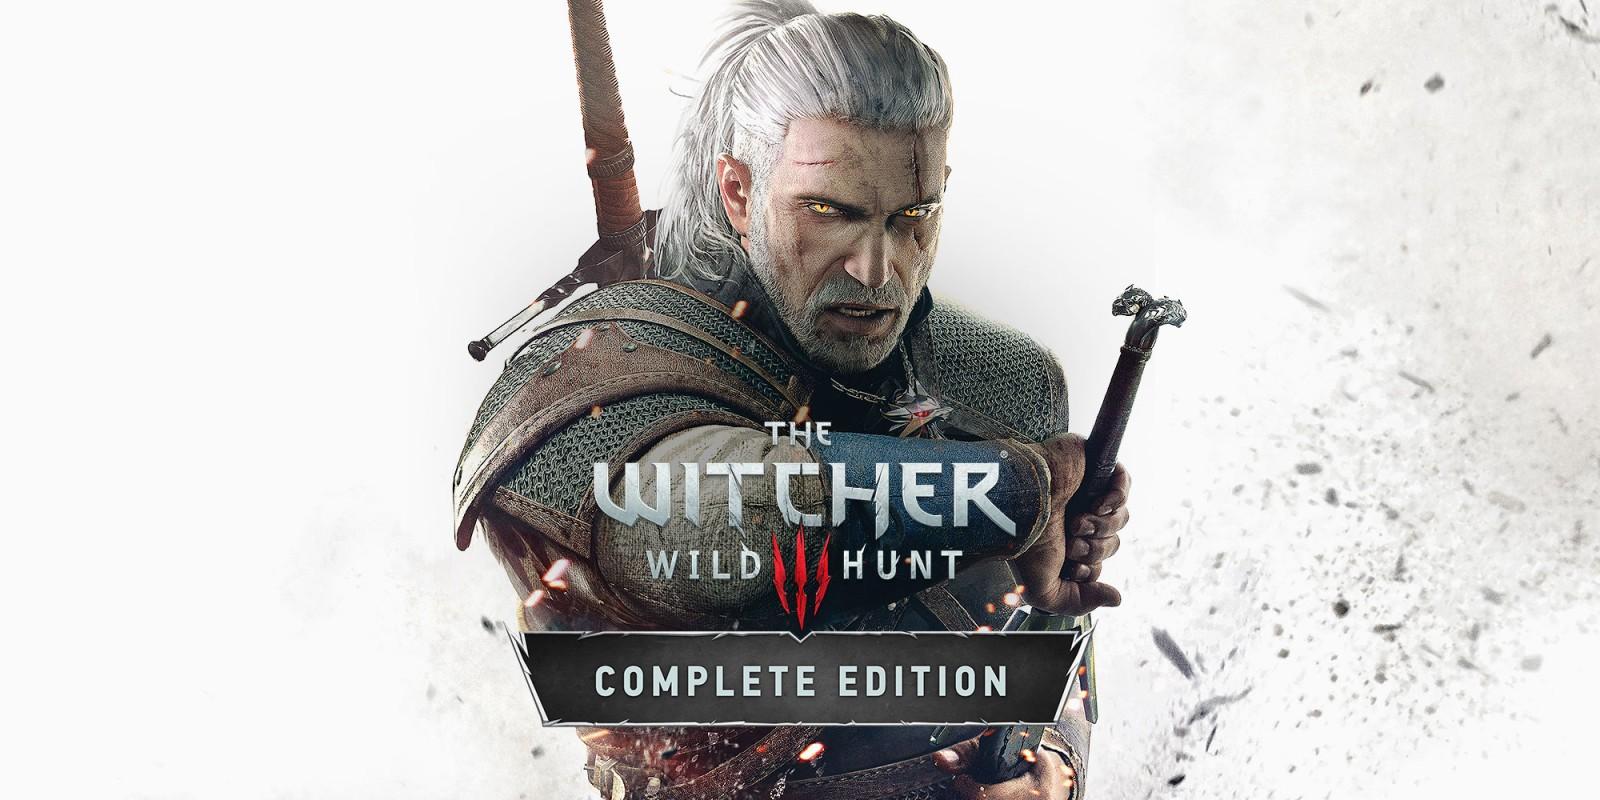 [Switch] Jogos em formato físico da semana – Ring Fit Adventure, Overwatch: Legendary Edition, The Witcher 3: Wild Hunt – Complete Edition e mais